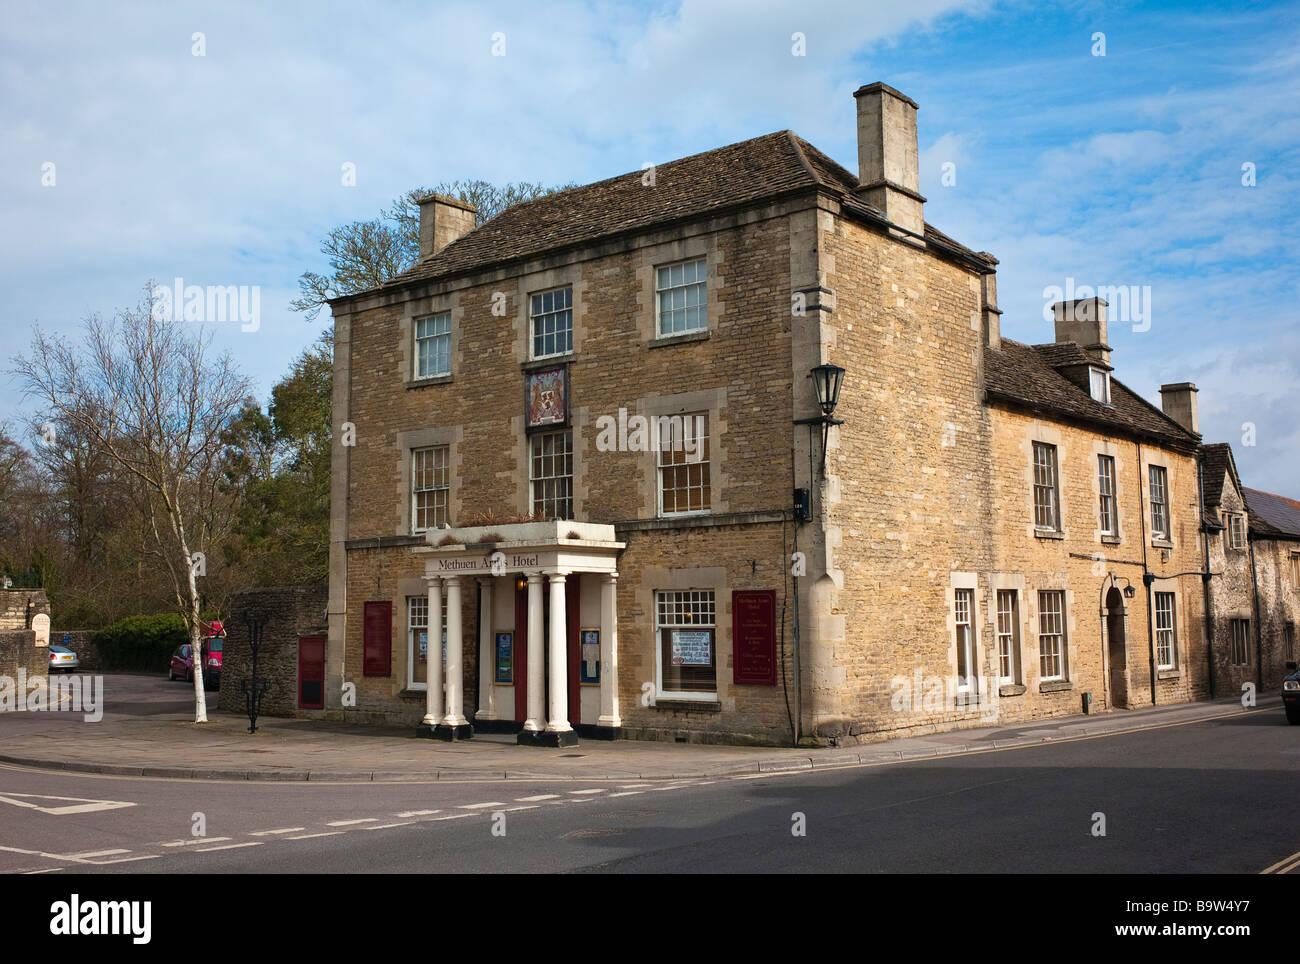 Inn Features Stock Photos & Inn Features Stock Images - Alamy